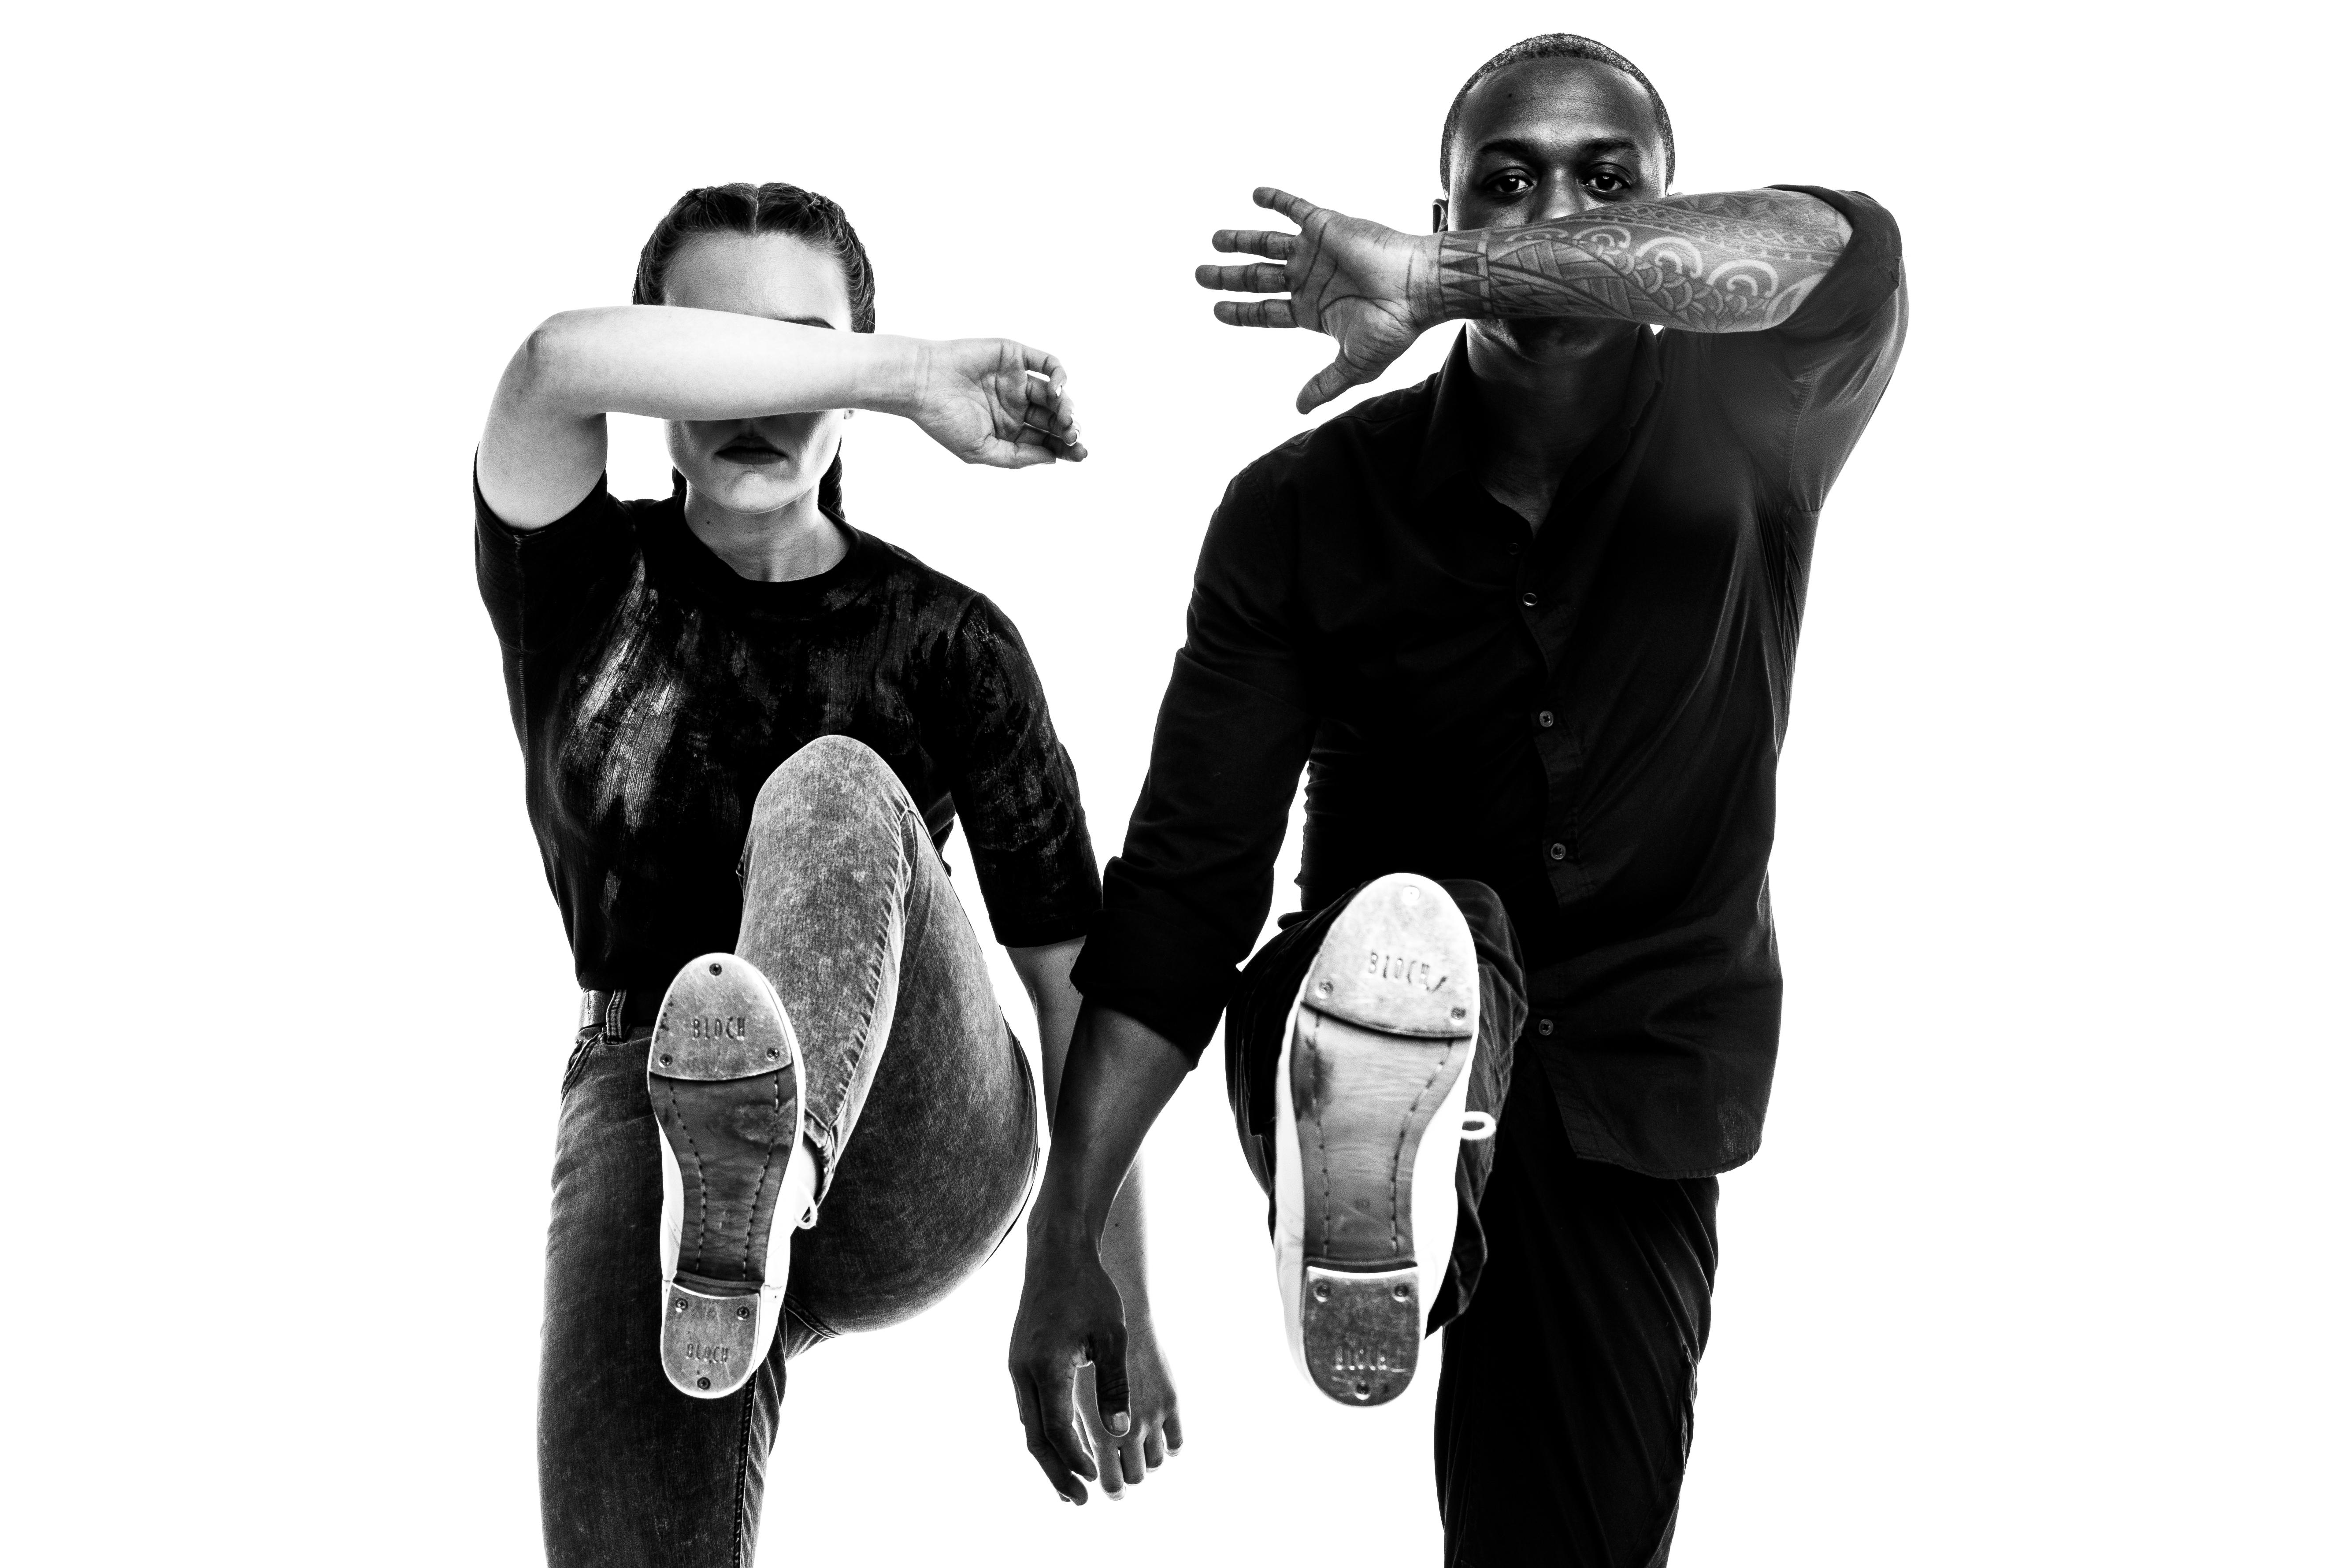 Elizabeth Burke & Christopher Broughton of Dorrance Dance at Northrop at the University of Minnesota